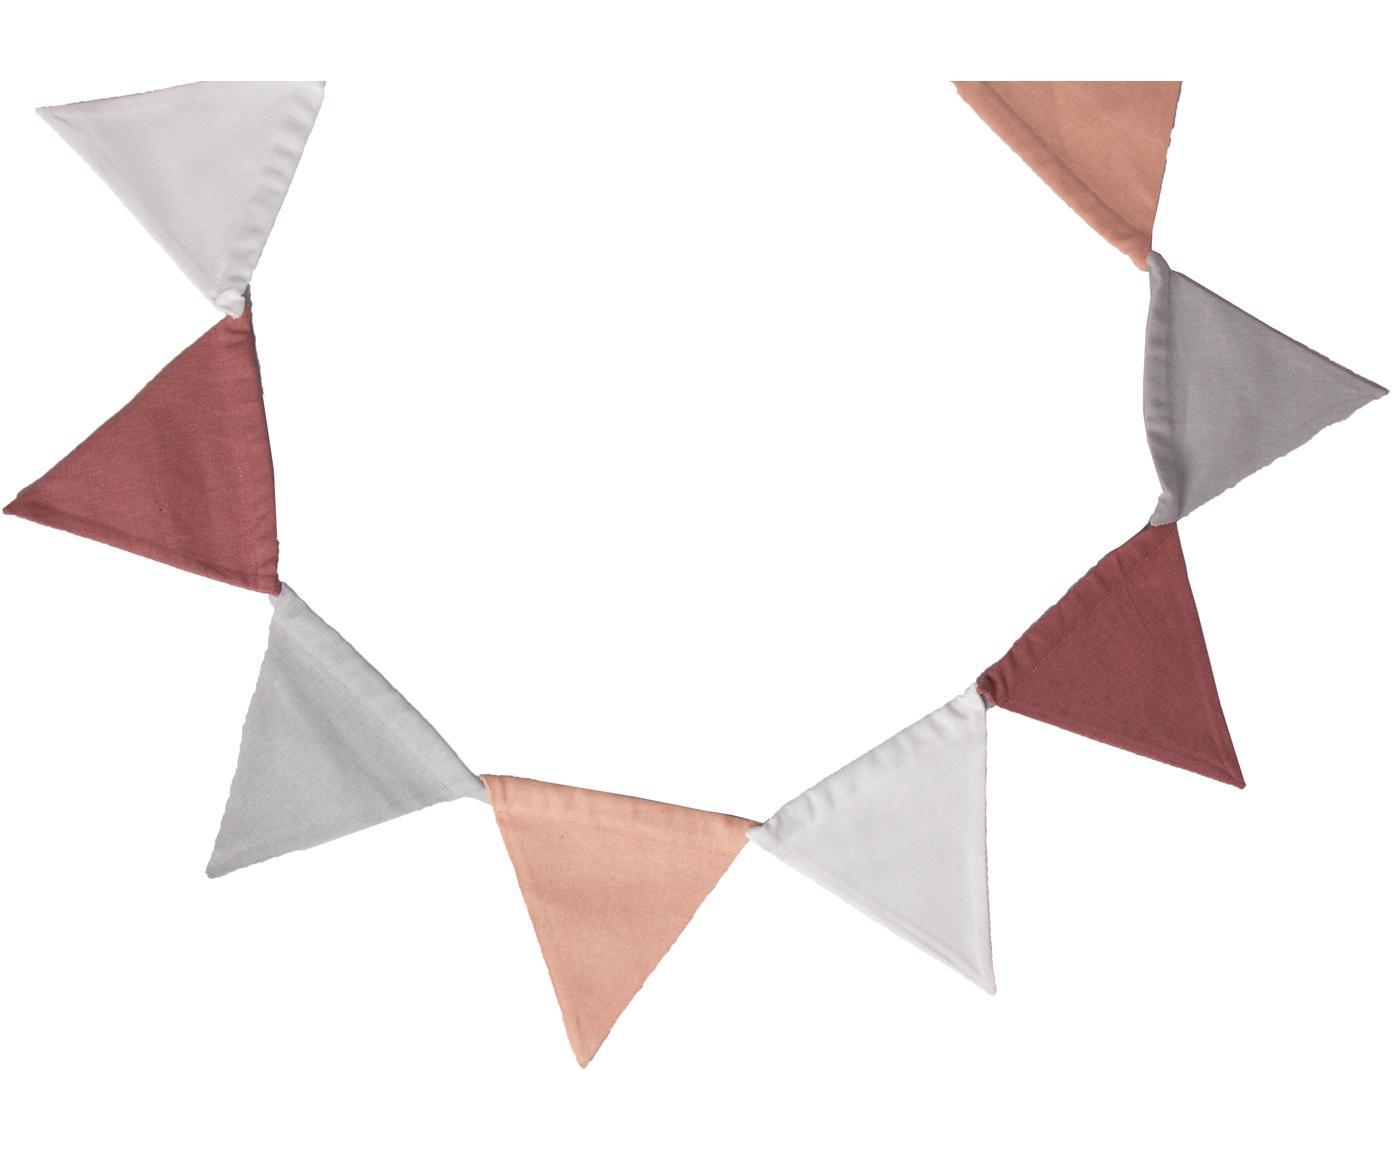 Slinger Vimply, Katoen, Roze, grijs, wit, donkerrood, L 250 cm